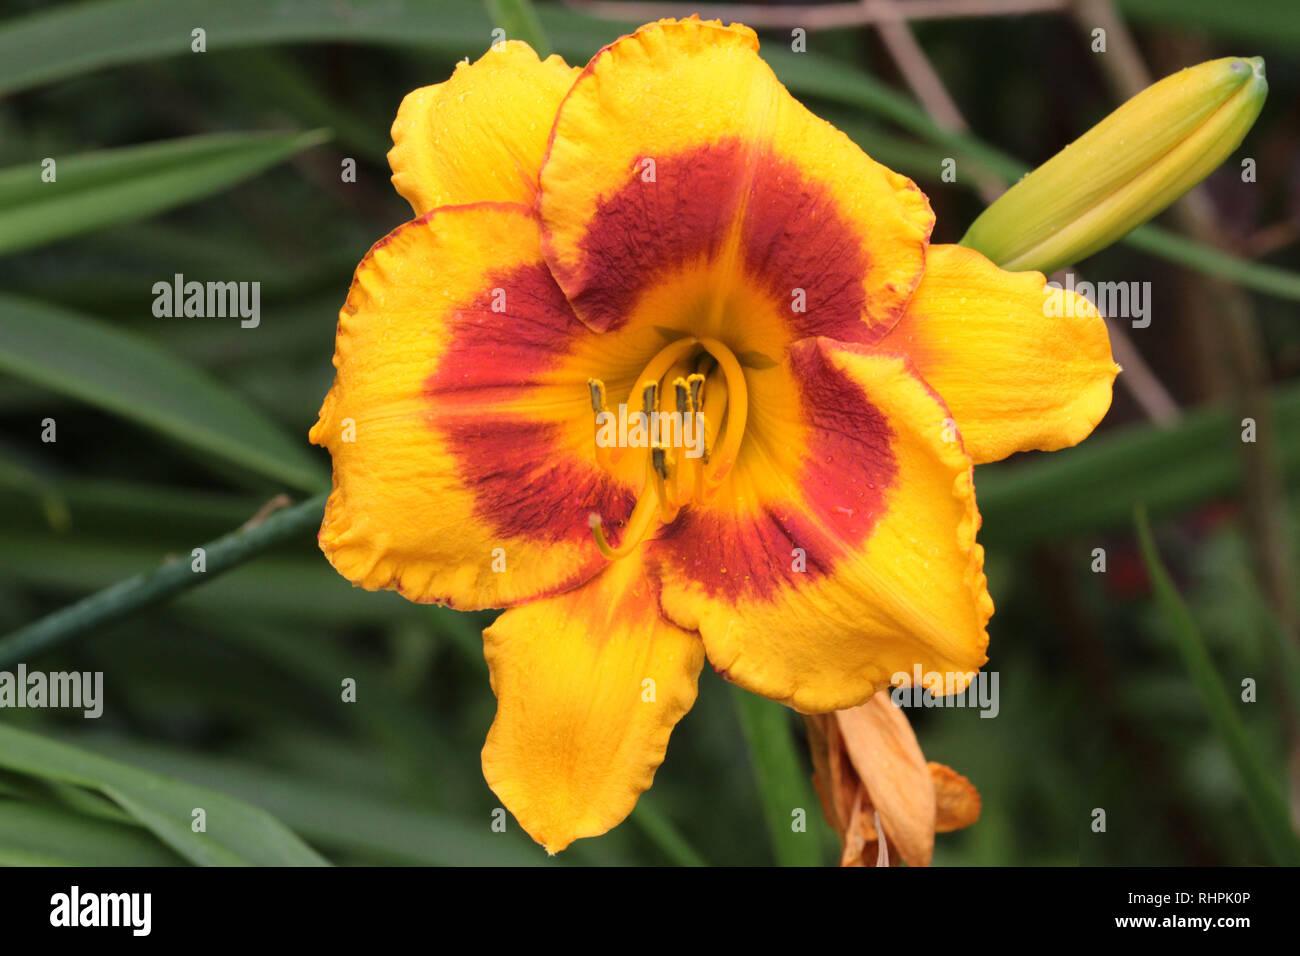 Day Lillies in Garden Stock Photo